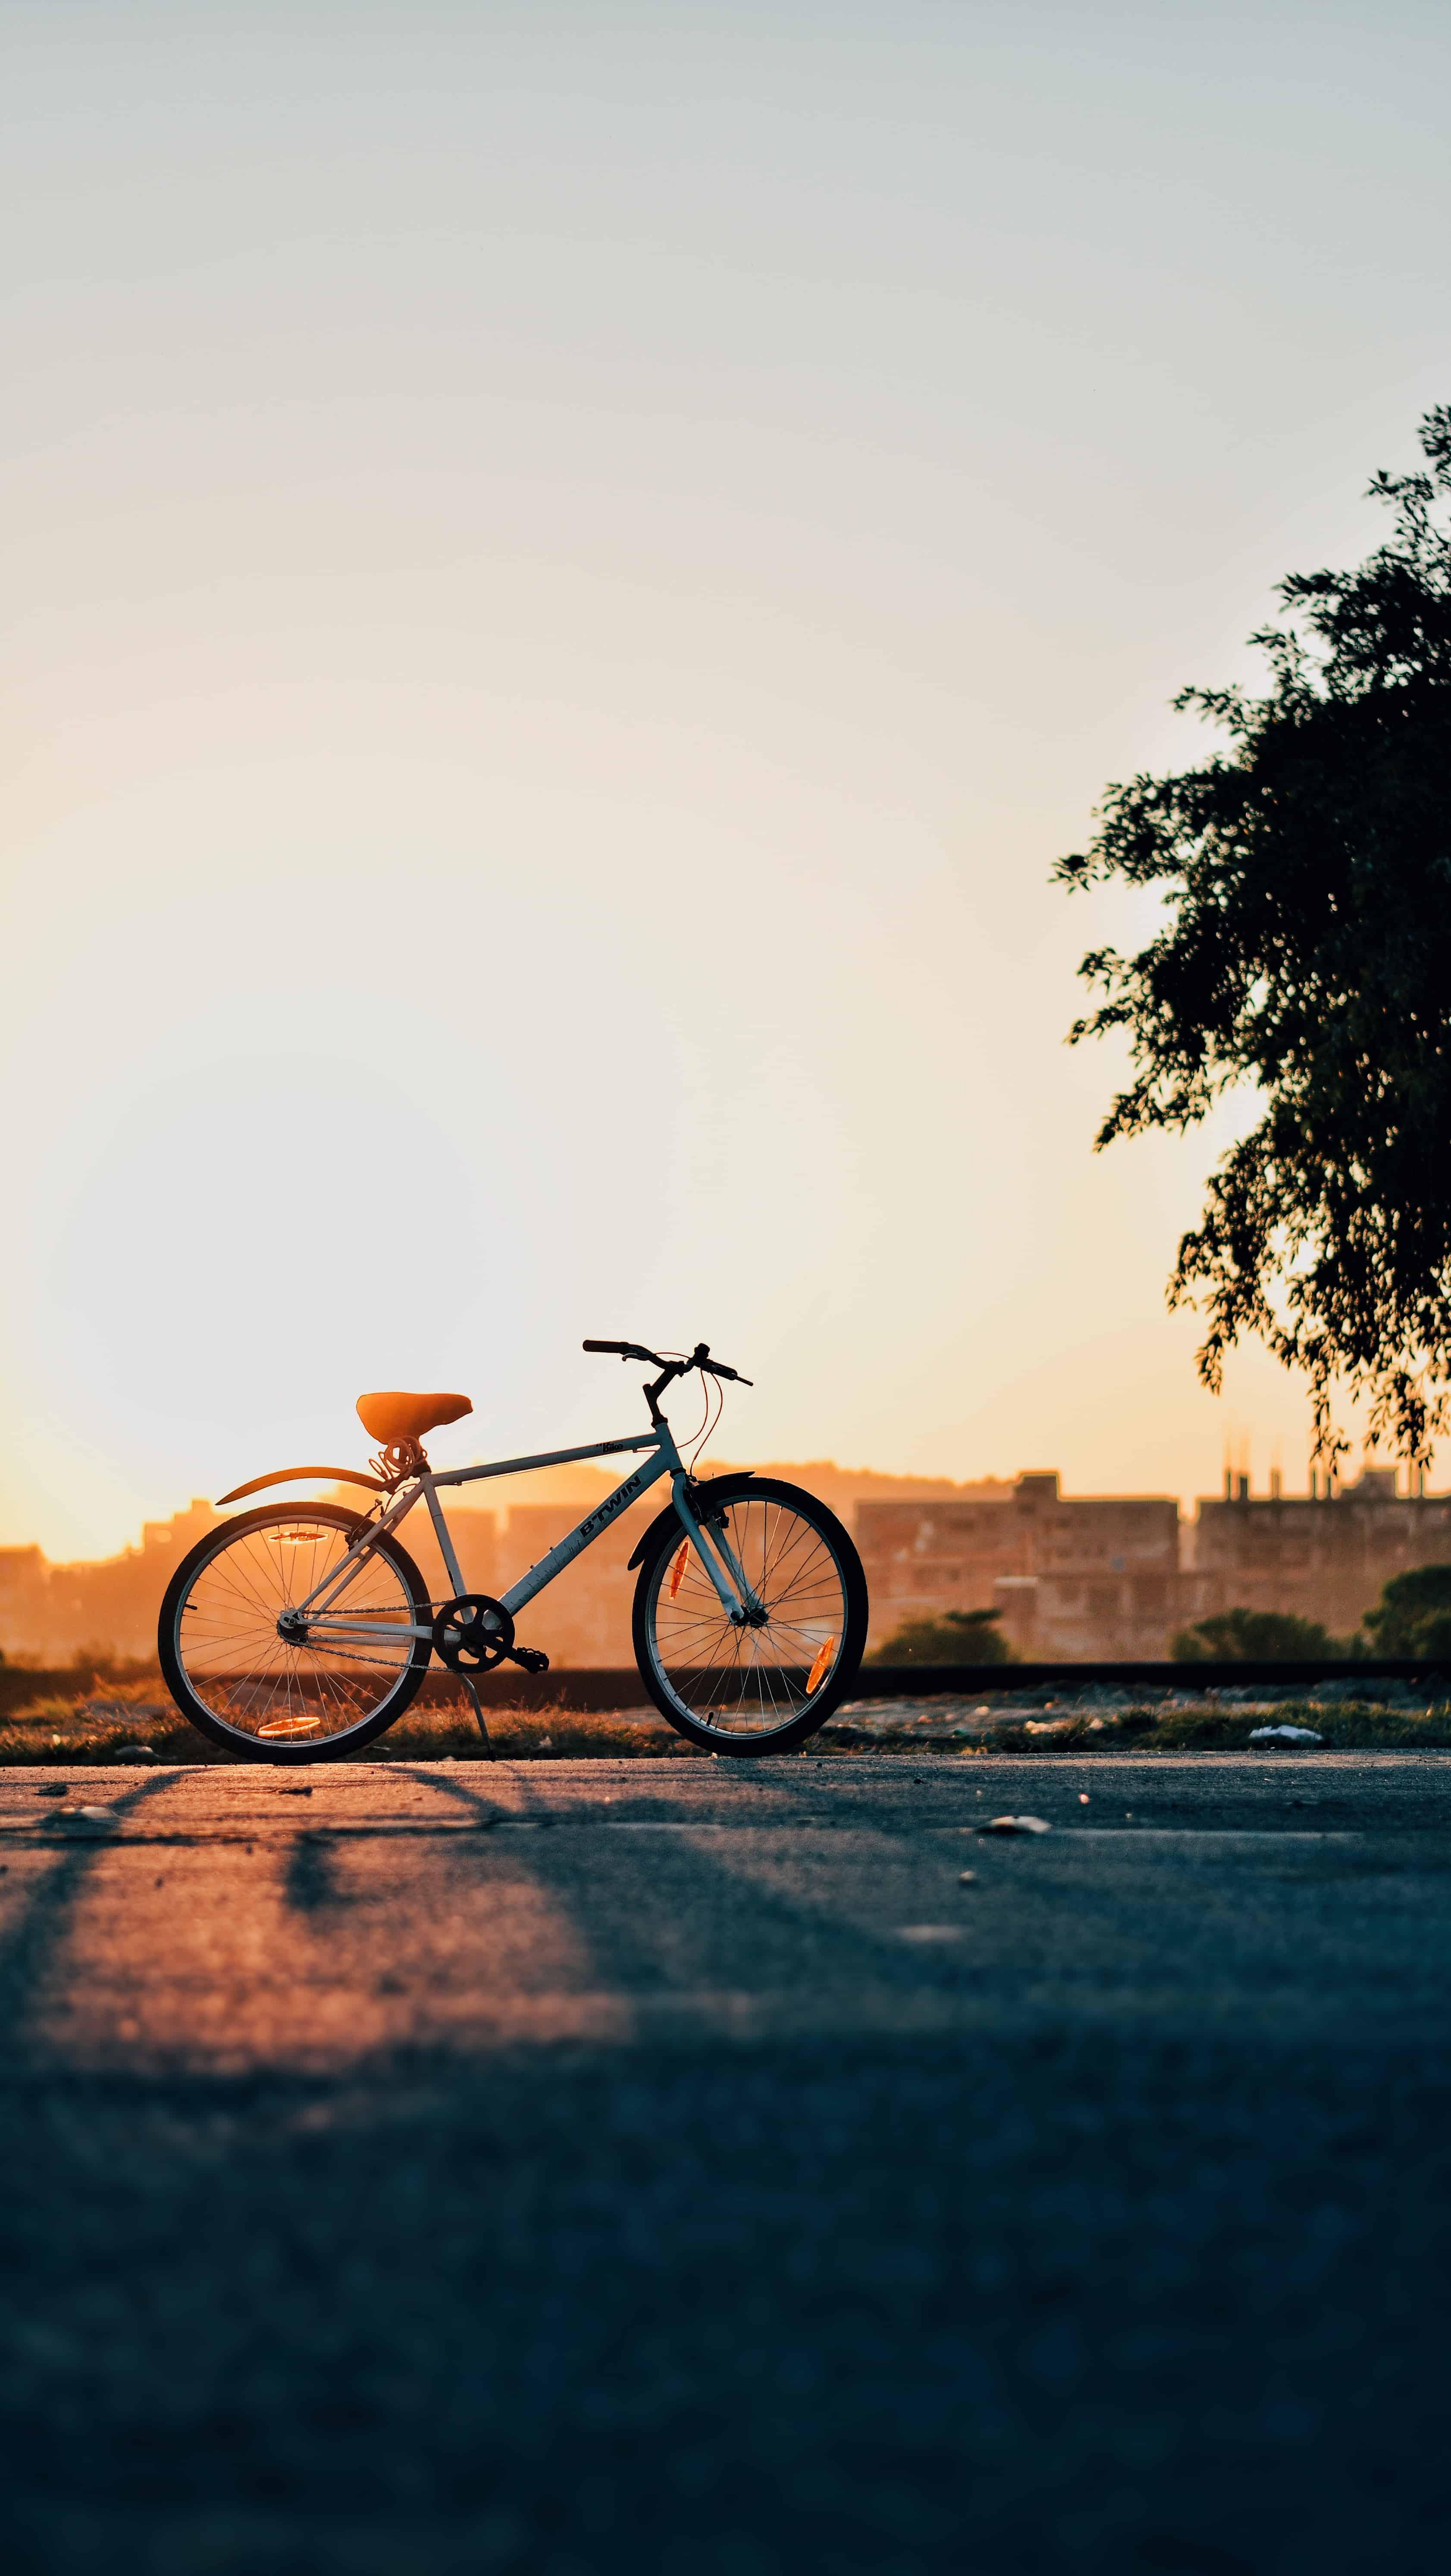 Male Bicyclist Injured in East 5th Street Crash [Oxnard, CA]